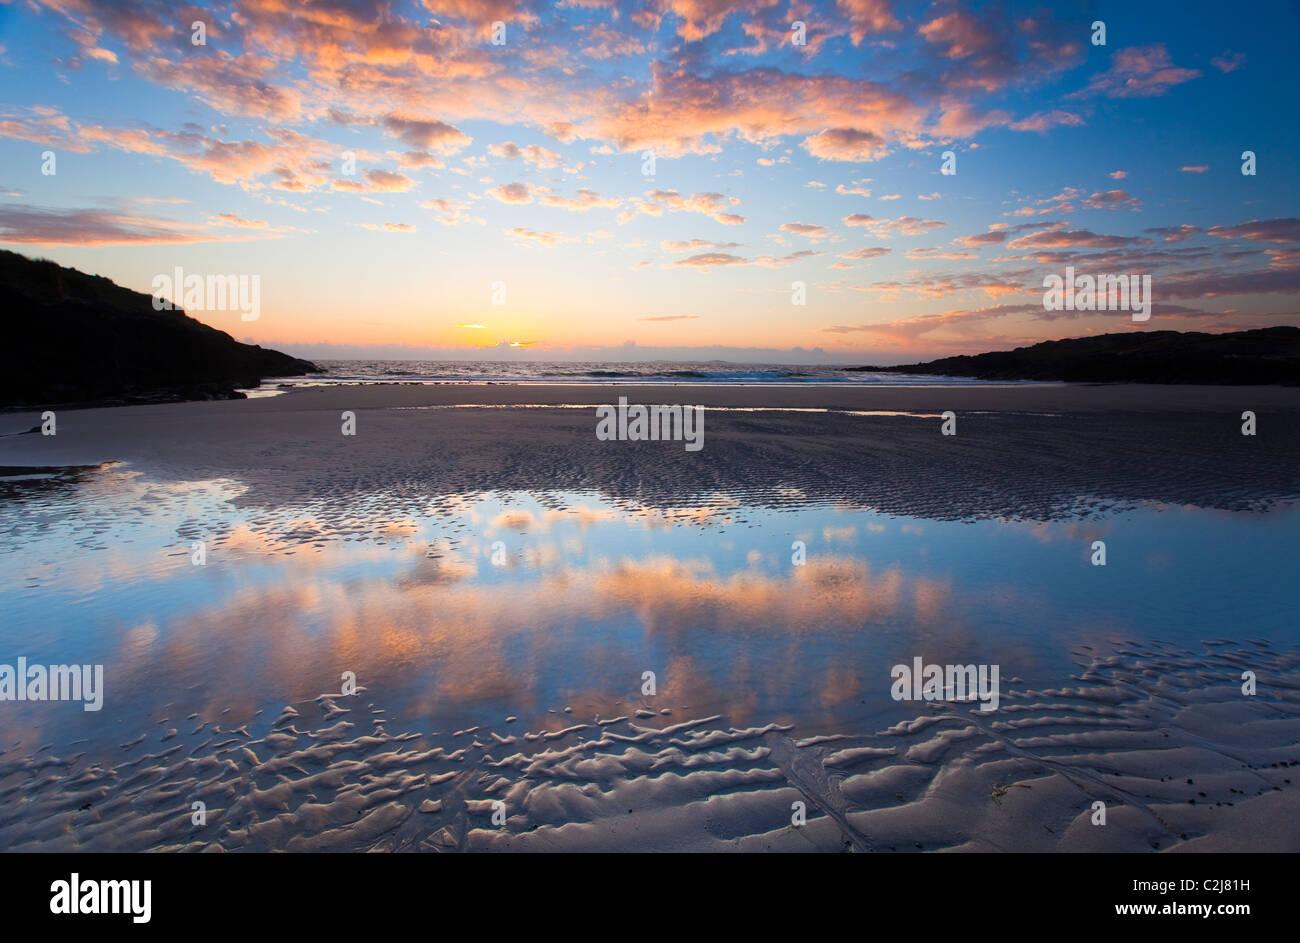 Soirée plage reflets dans False Bay, Connemara, comté de Galway, Irlande. Photo Stock